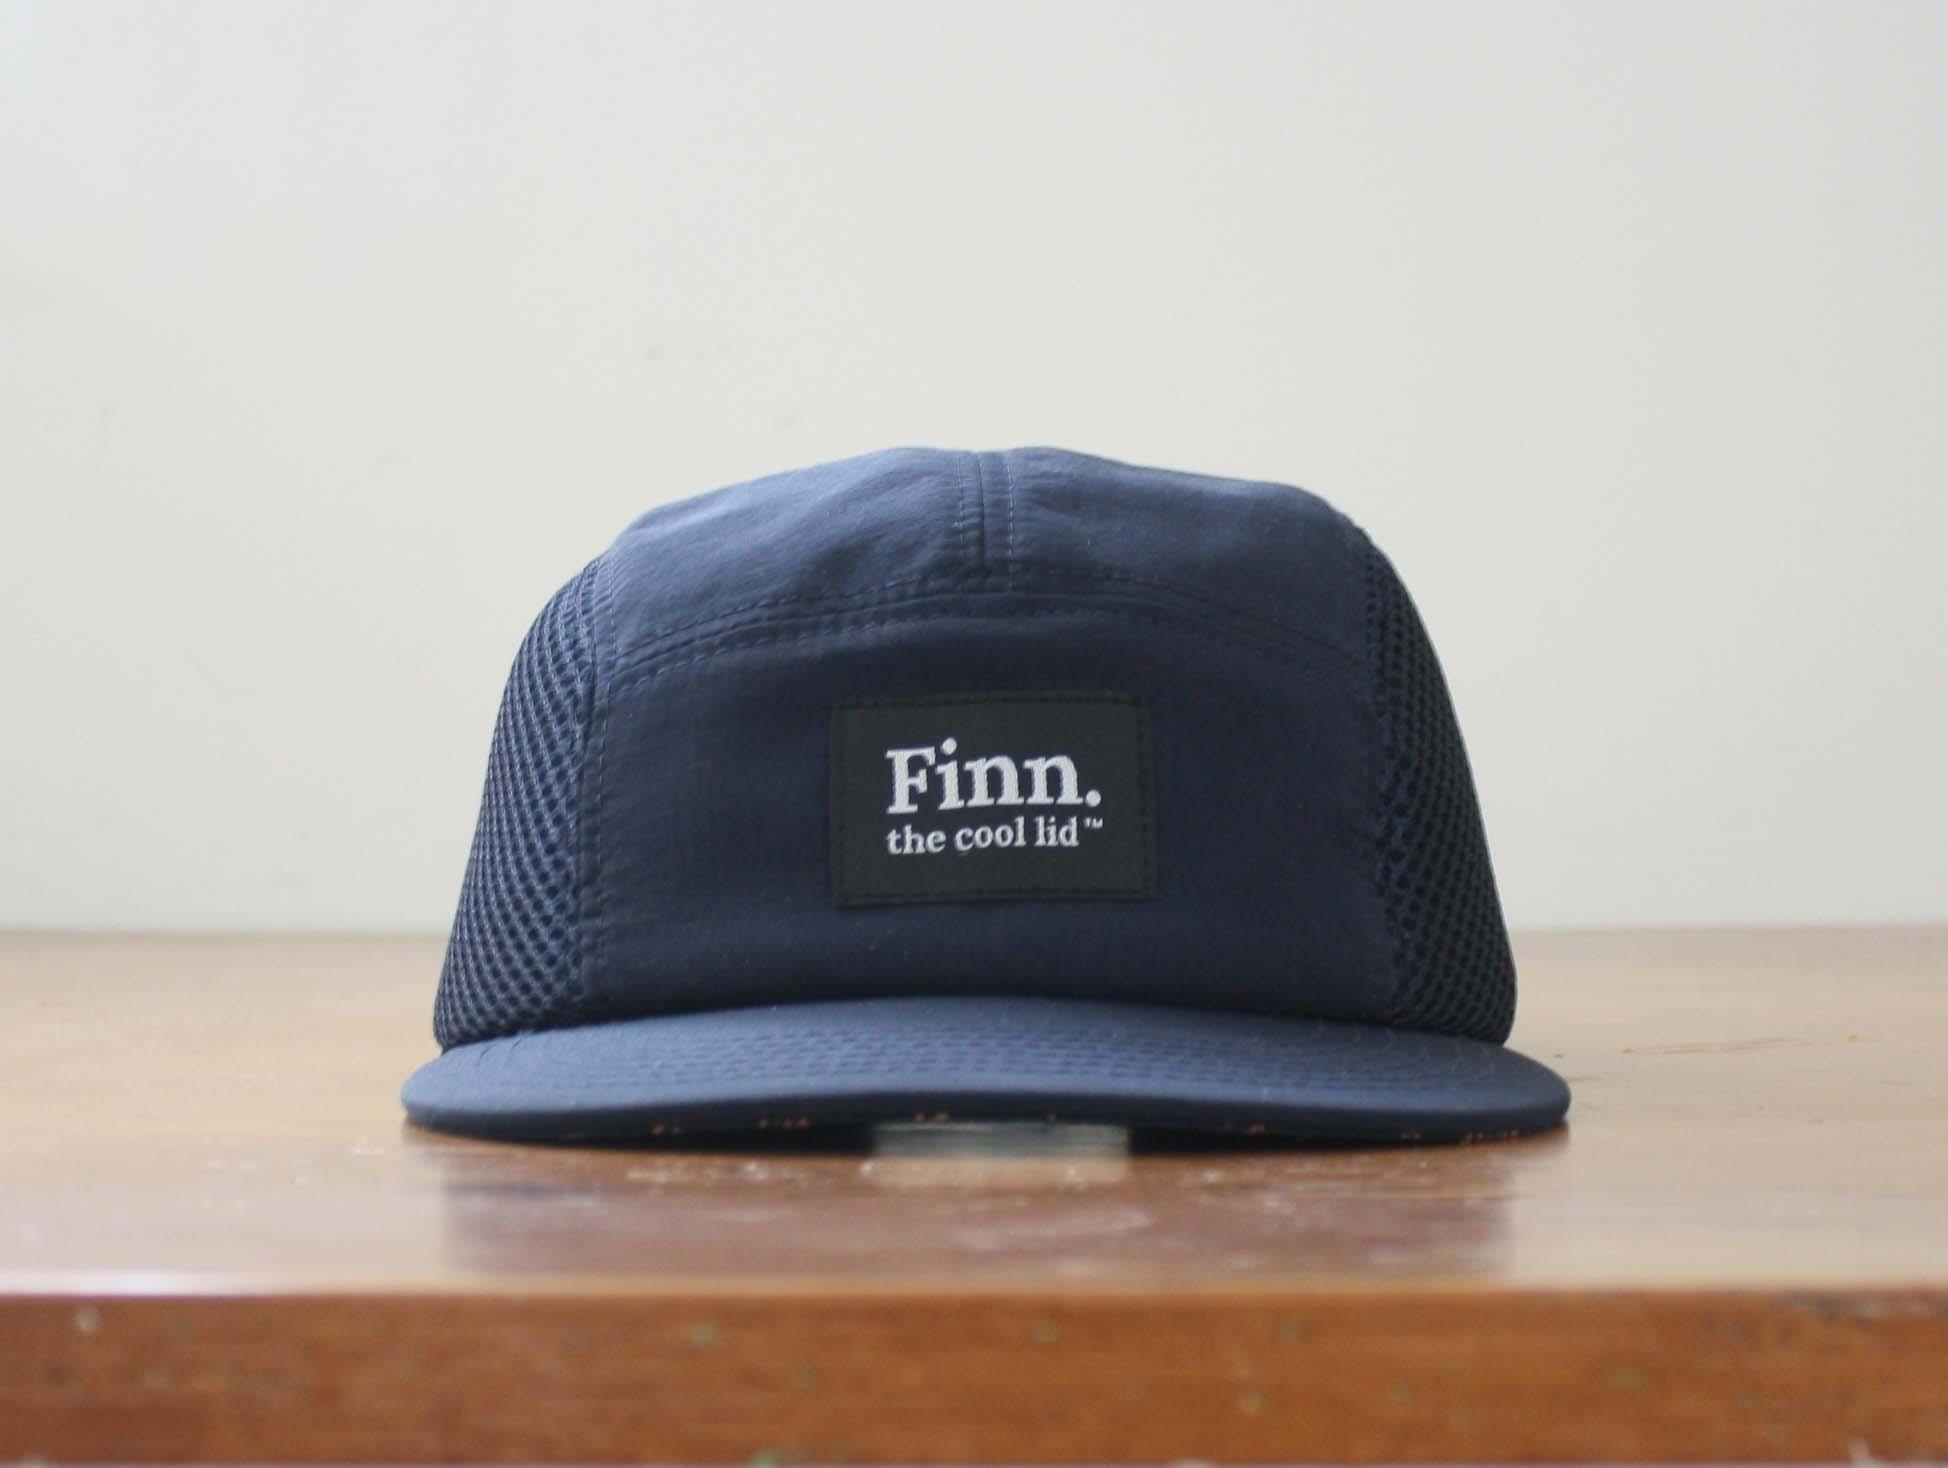 02_Finn_Post (1)